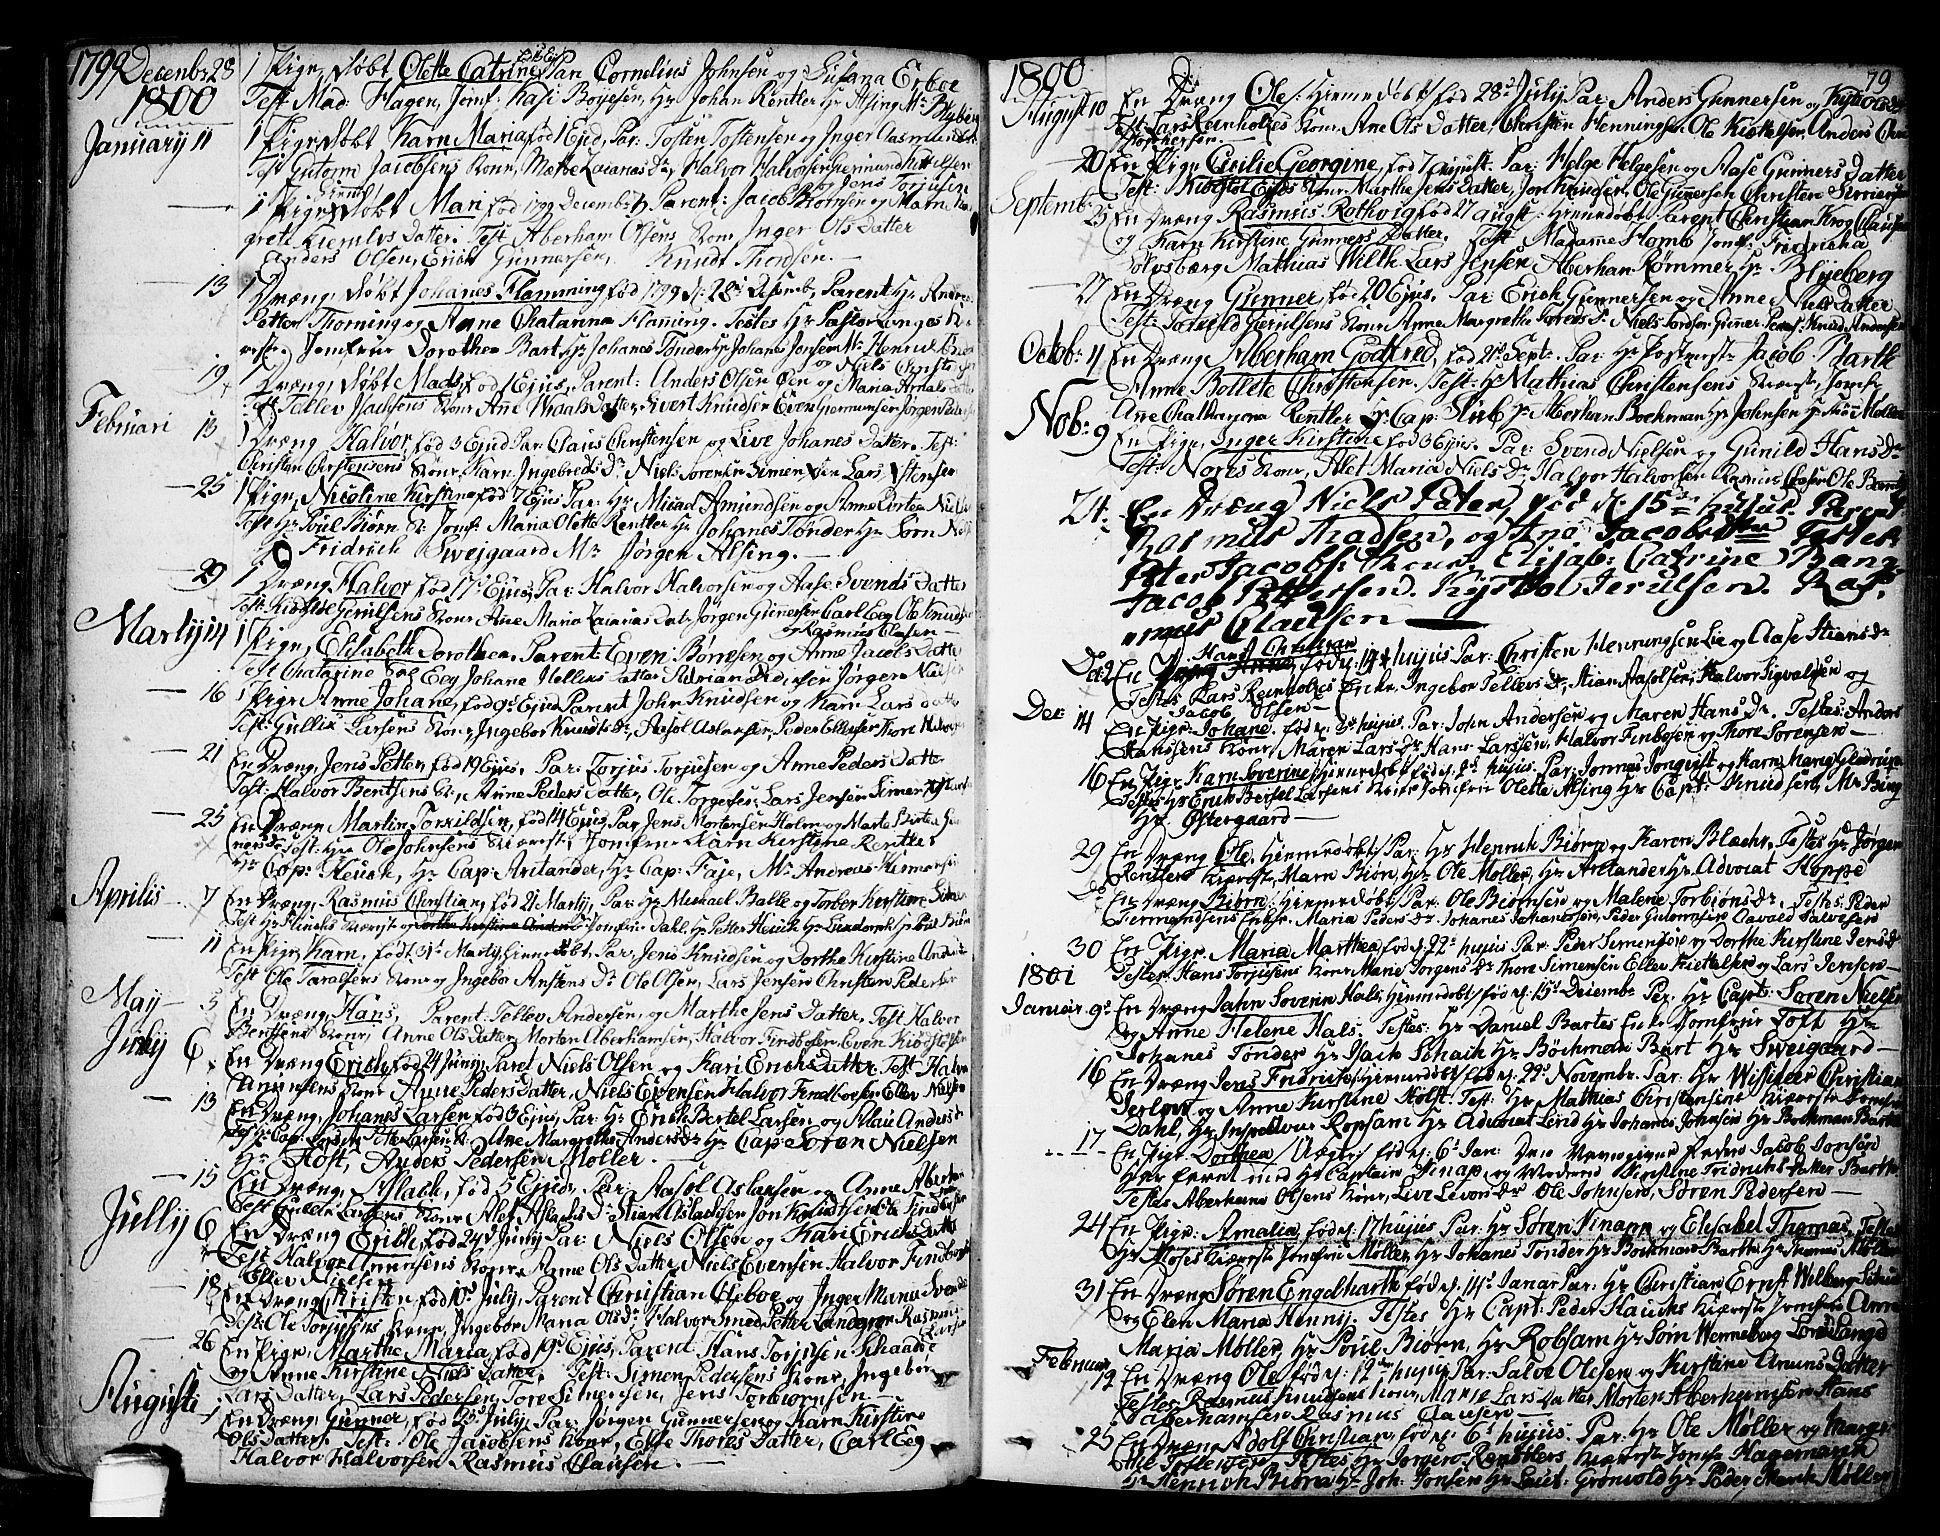 SAKO, Kragerø kirkebøker, F/Fa/L0002: Ministerialbok nr. 2, 1767-1802, s. 79